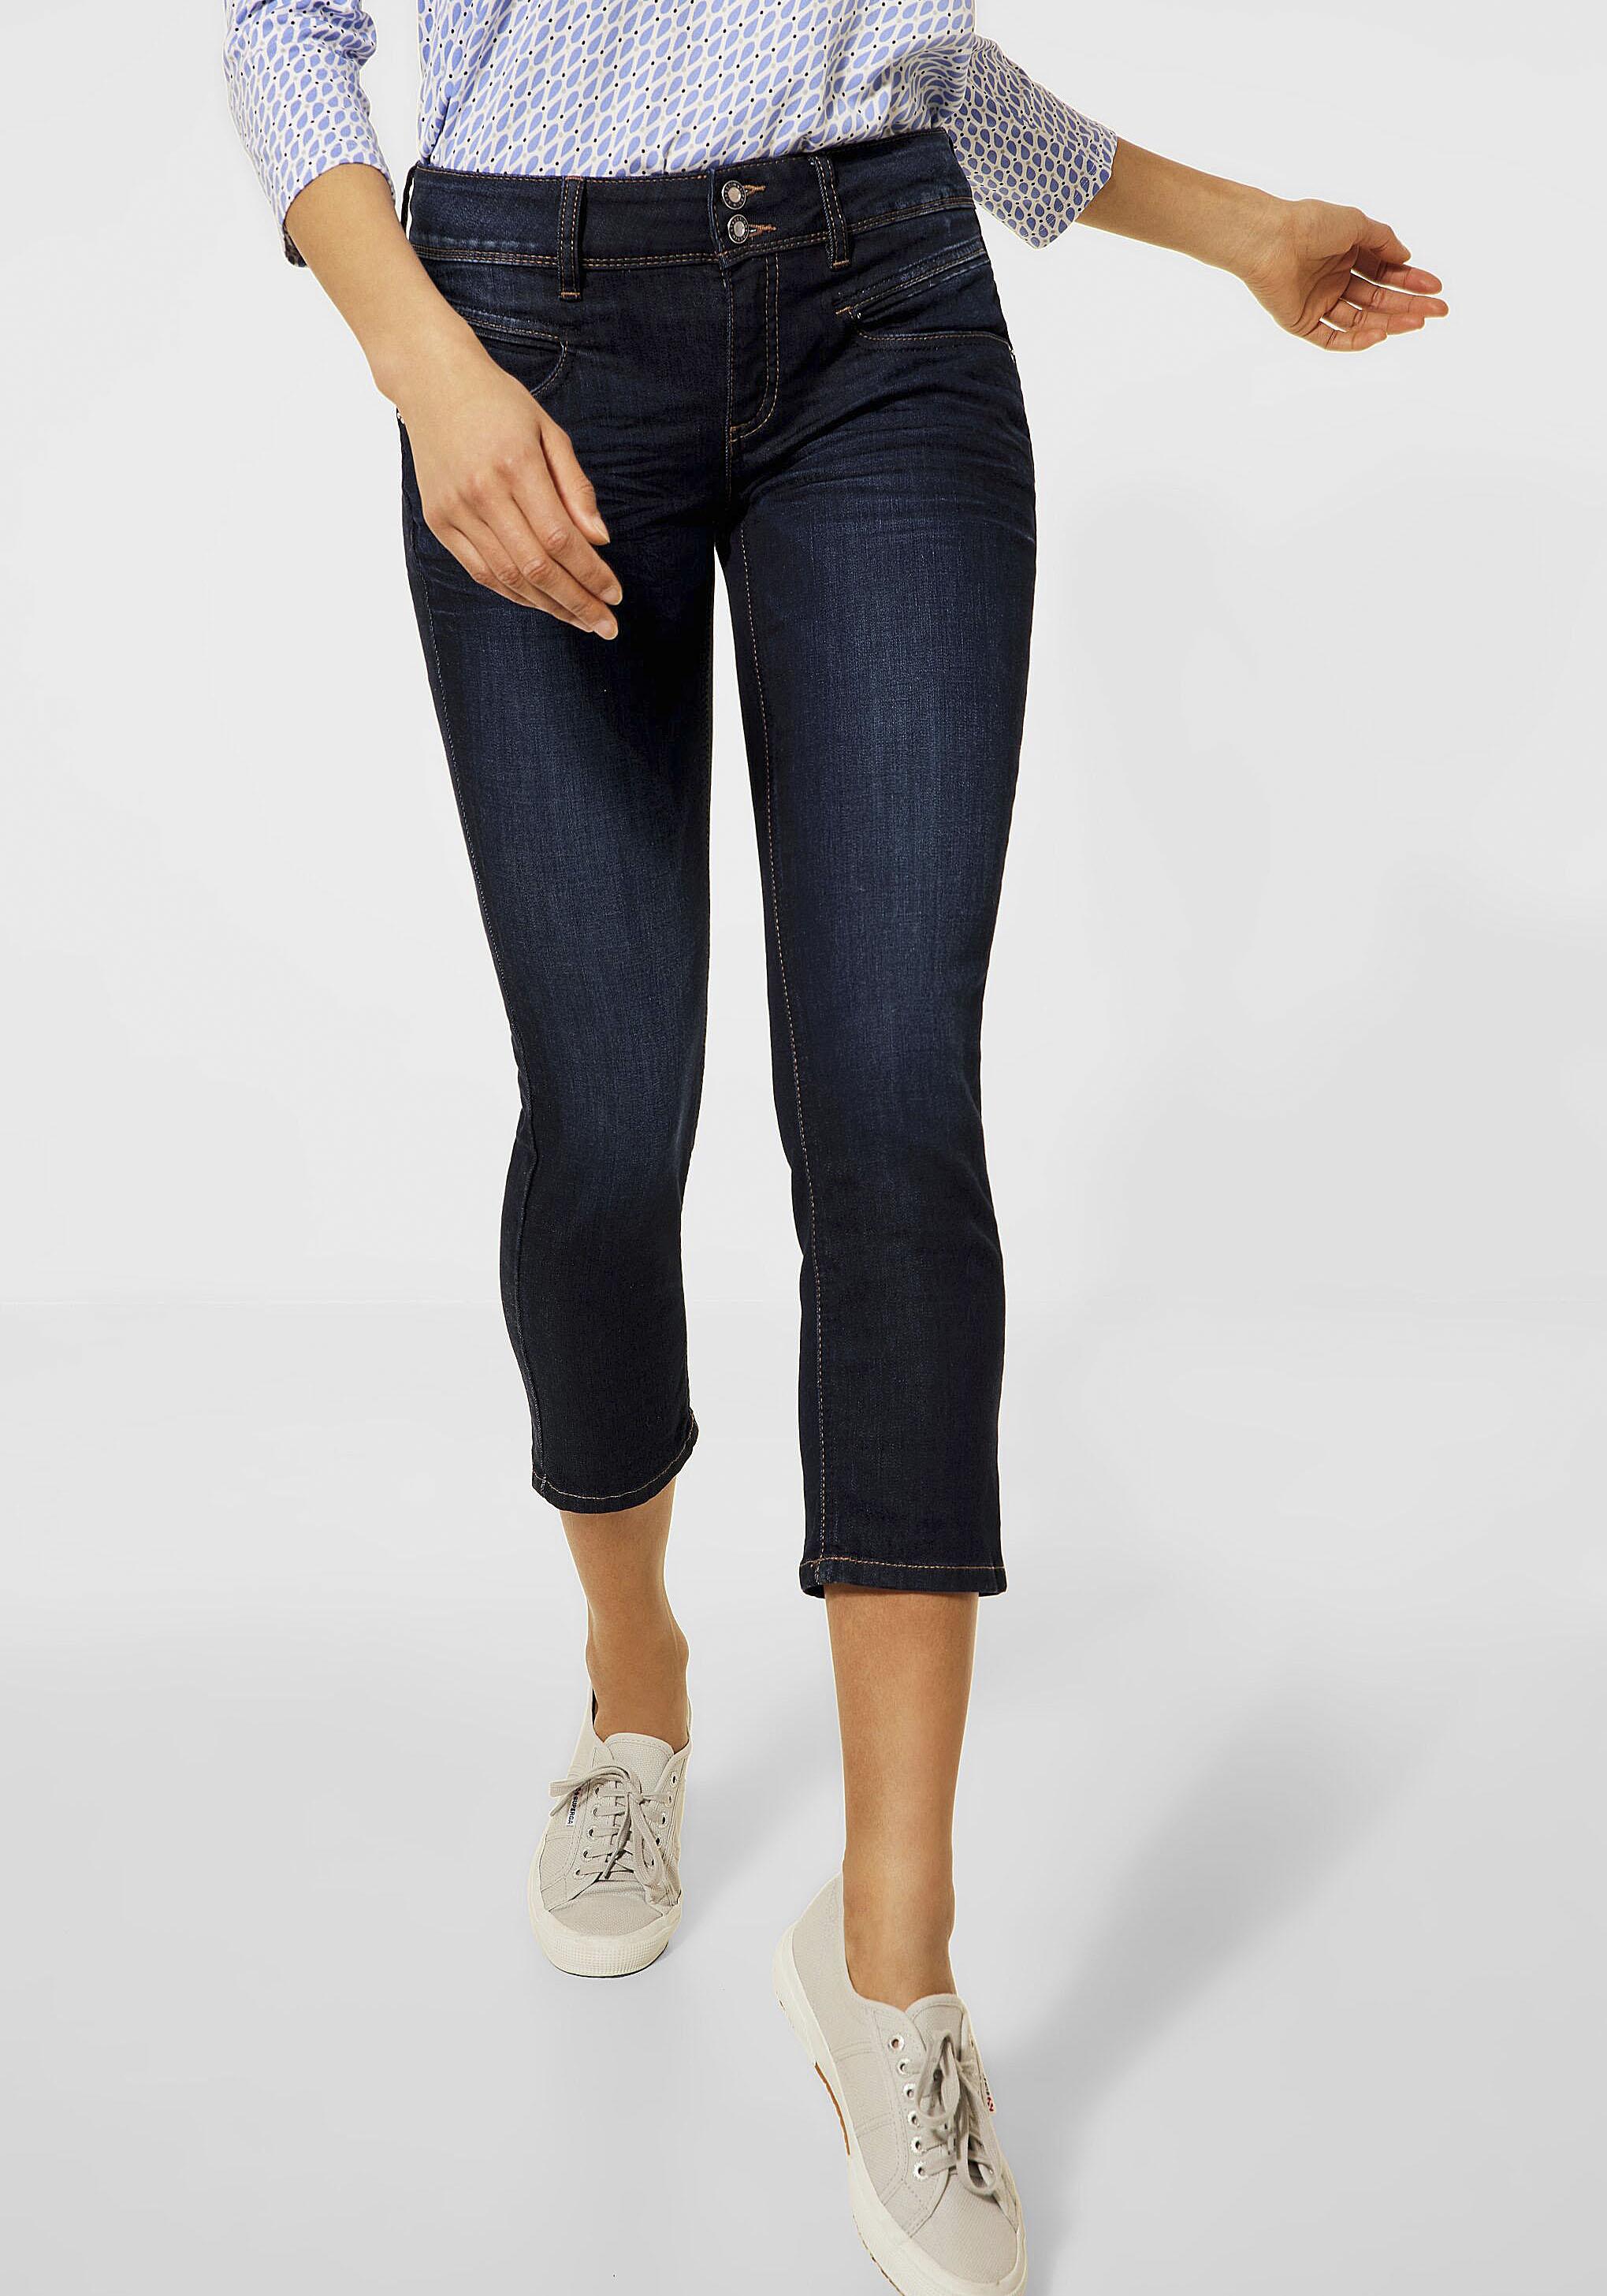 street one -  3/4-Jeans Jane, mit kontrastfarbenen Nähten